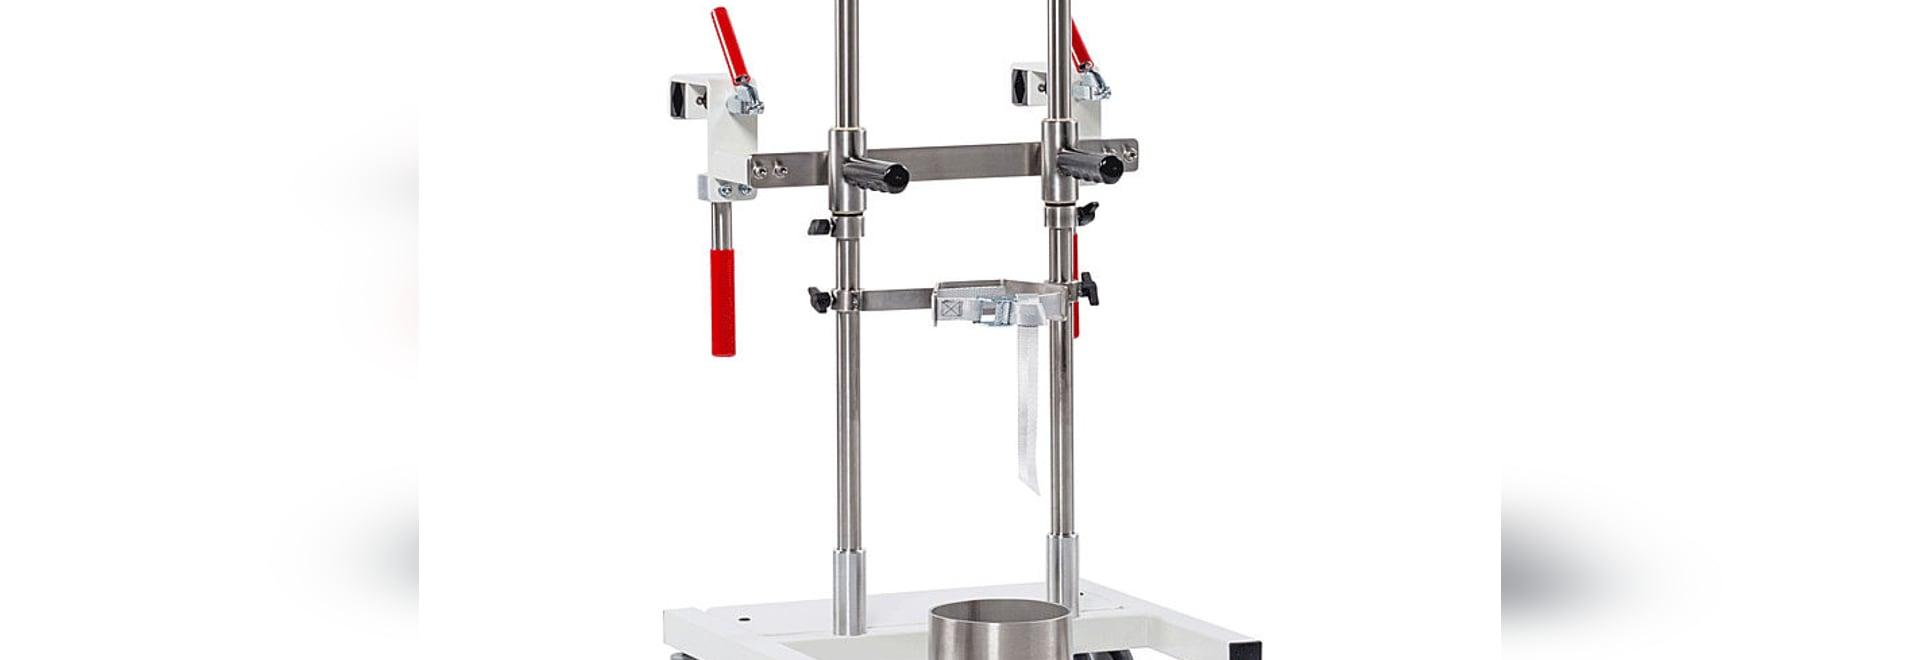 OxyDoc Light - the dockable oxygen cylinder cart for patient beds